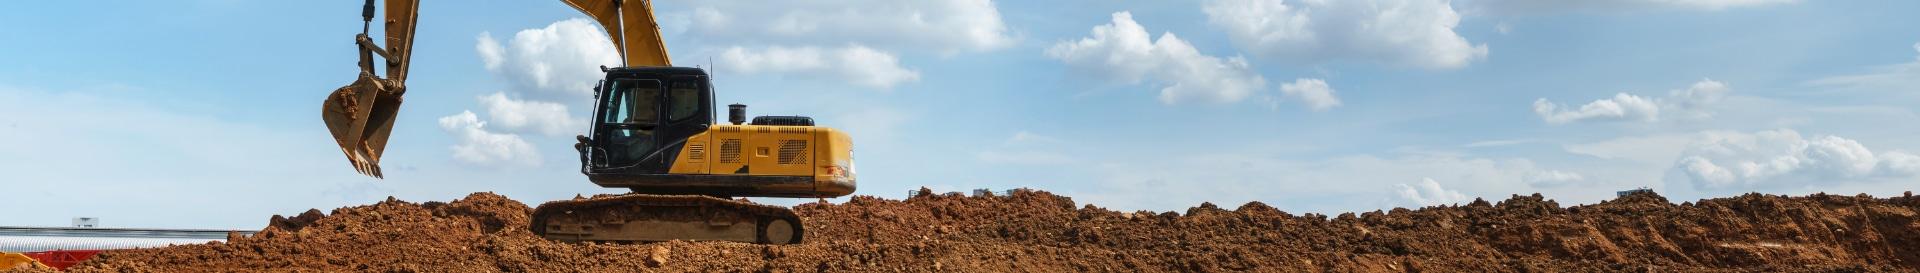 Tractor digging dirt